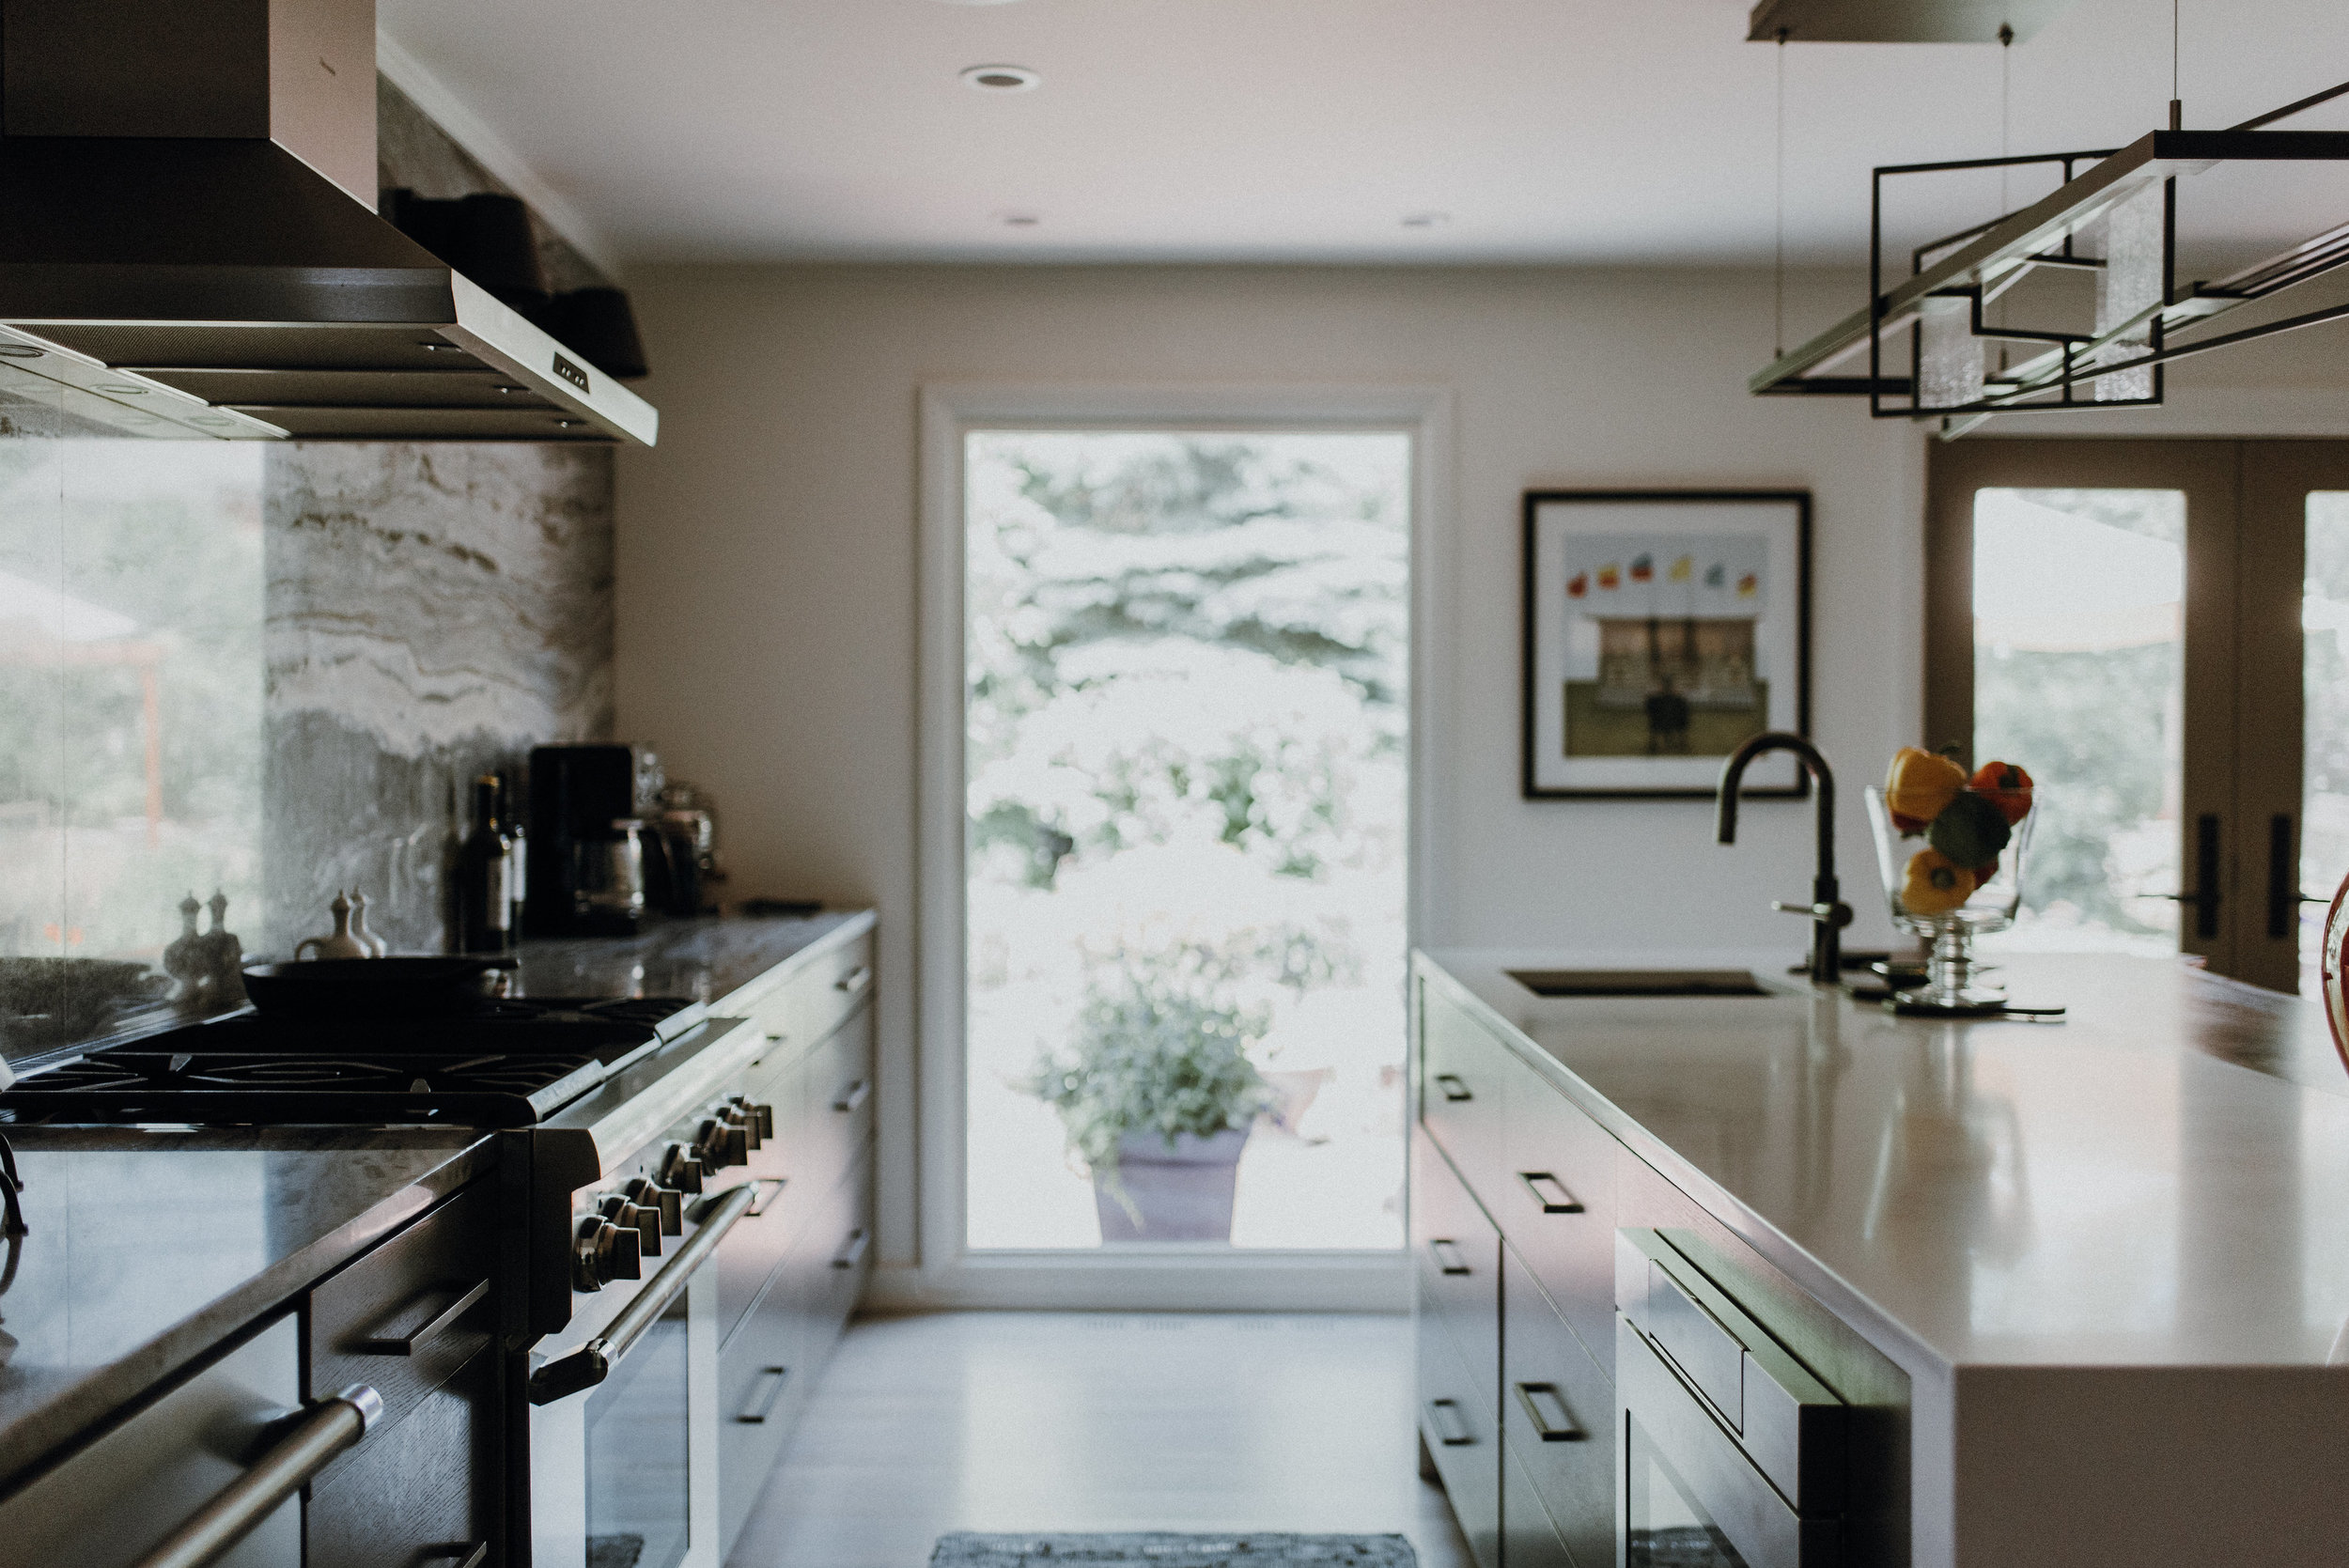 byron_kitchen.jpg